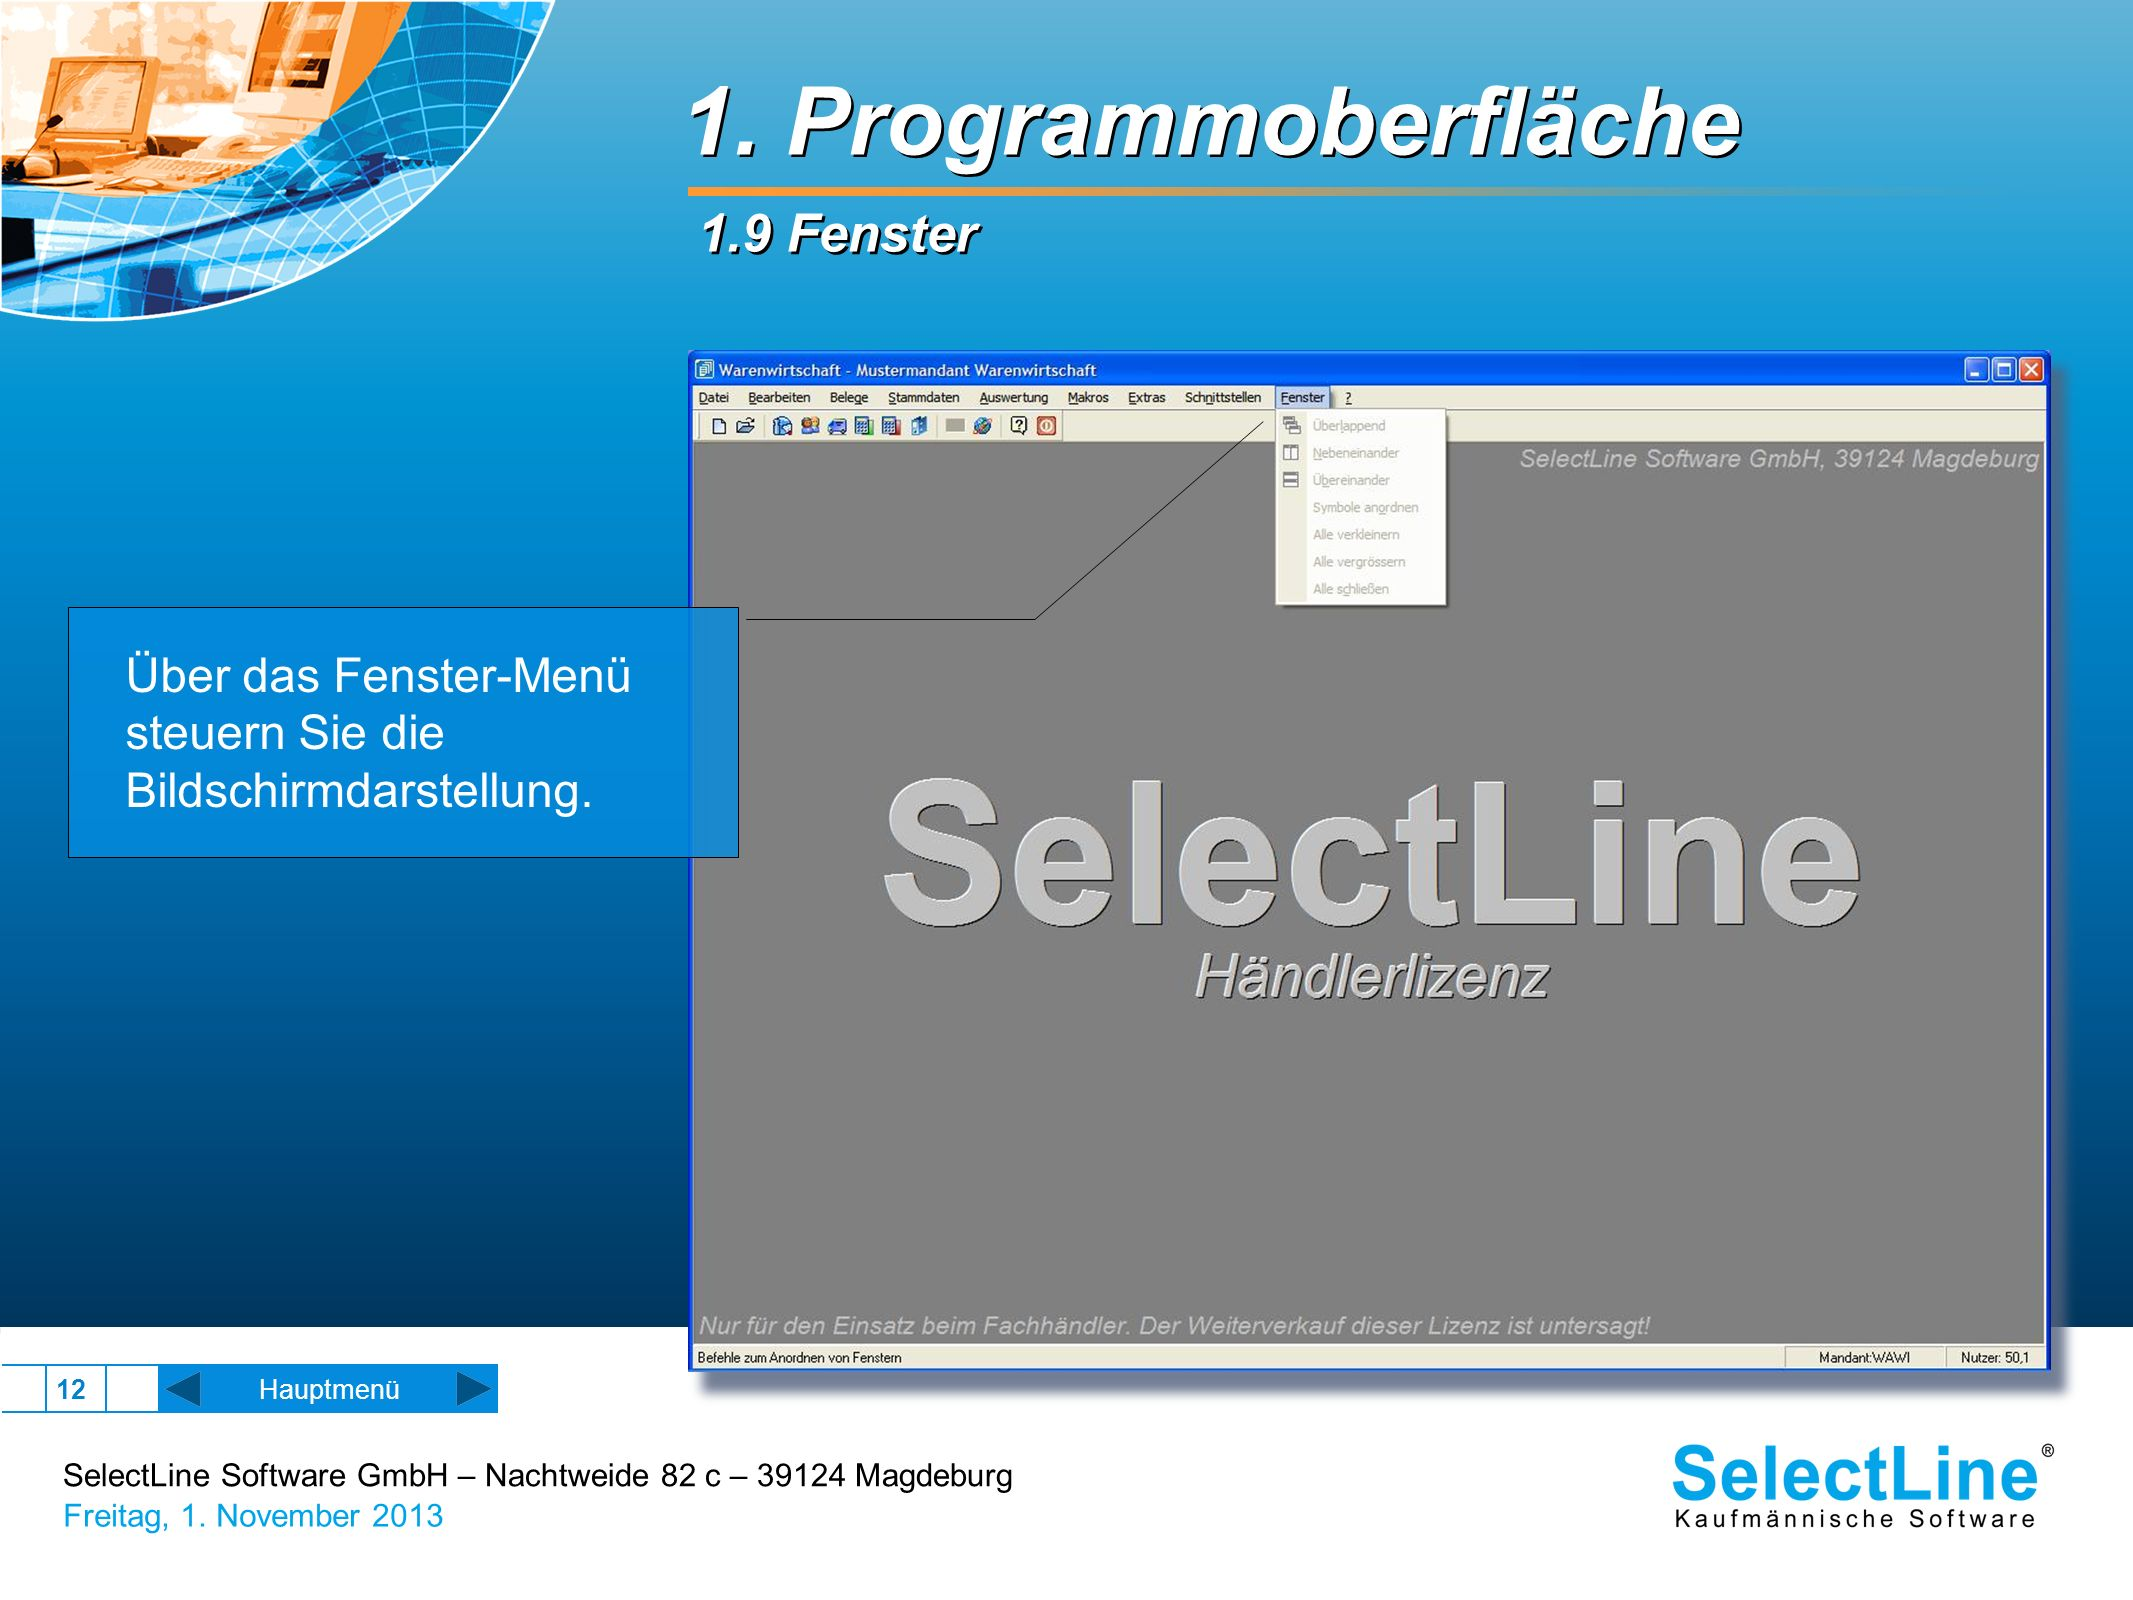 1. Programmoberfläche 1.9 Fenster